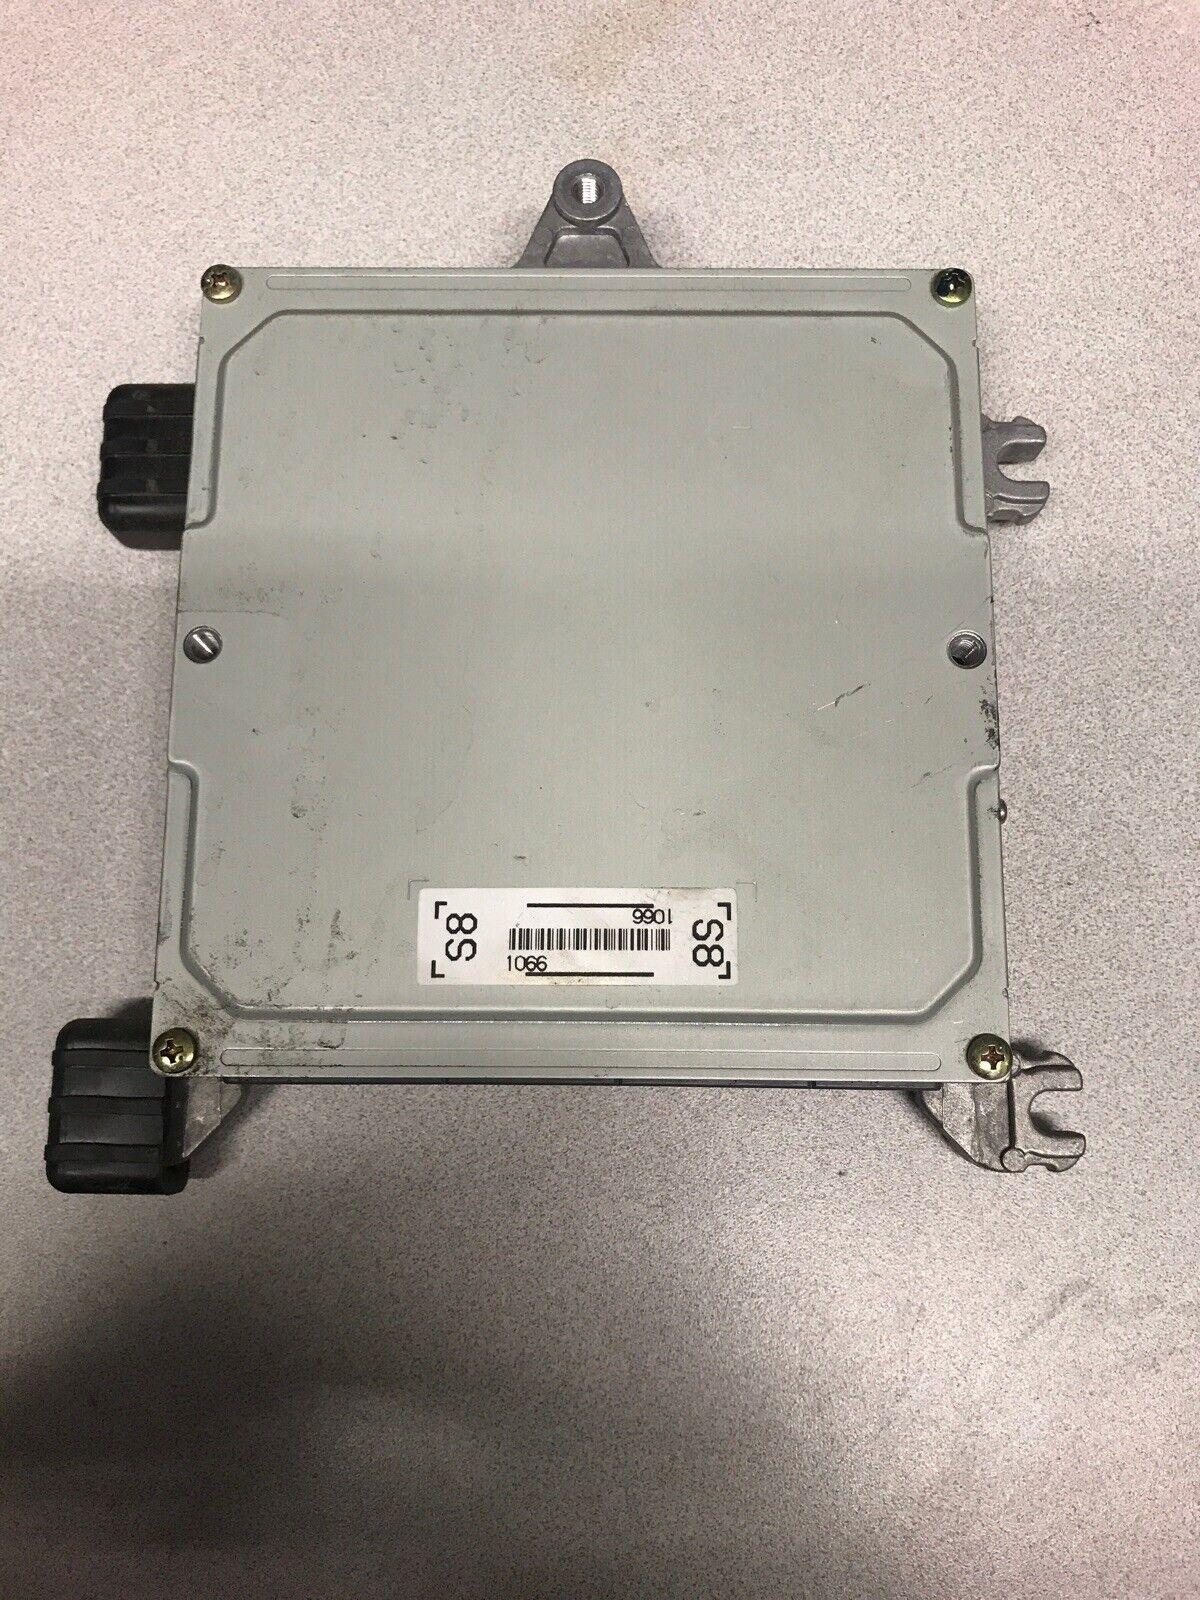 98 1998 Honda CRV ECU ECM 37820-P3F-L54 S8 Computer Used OEM